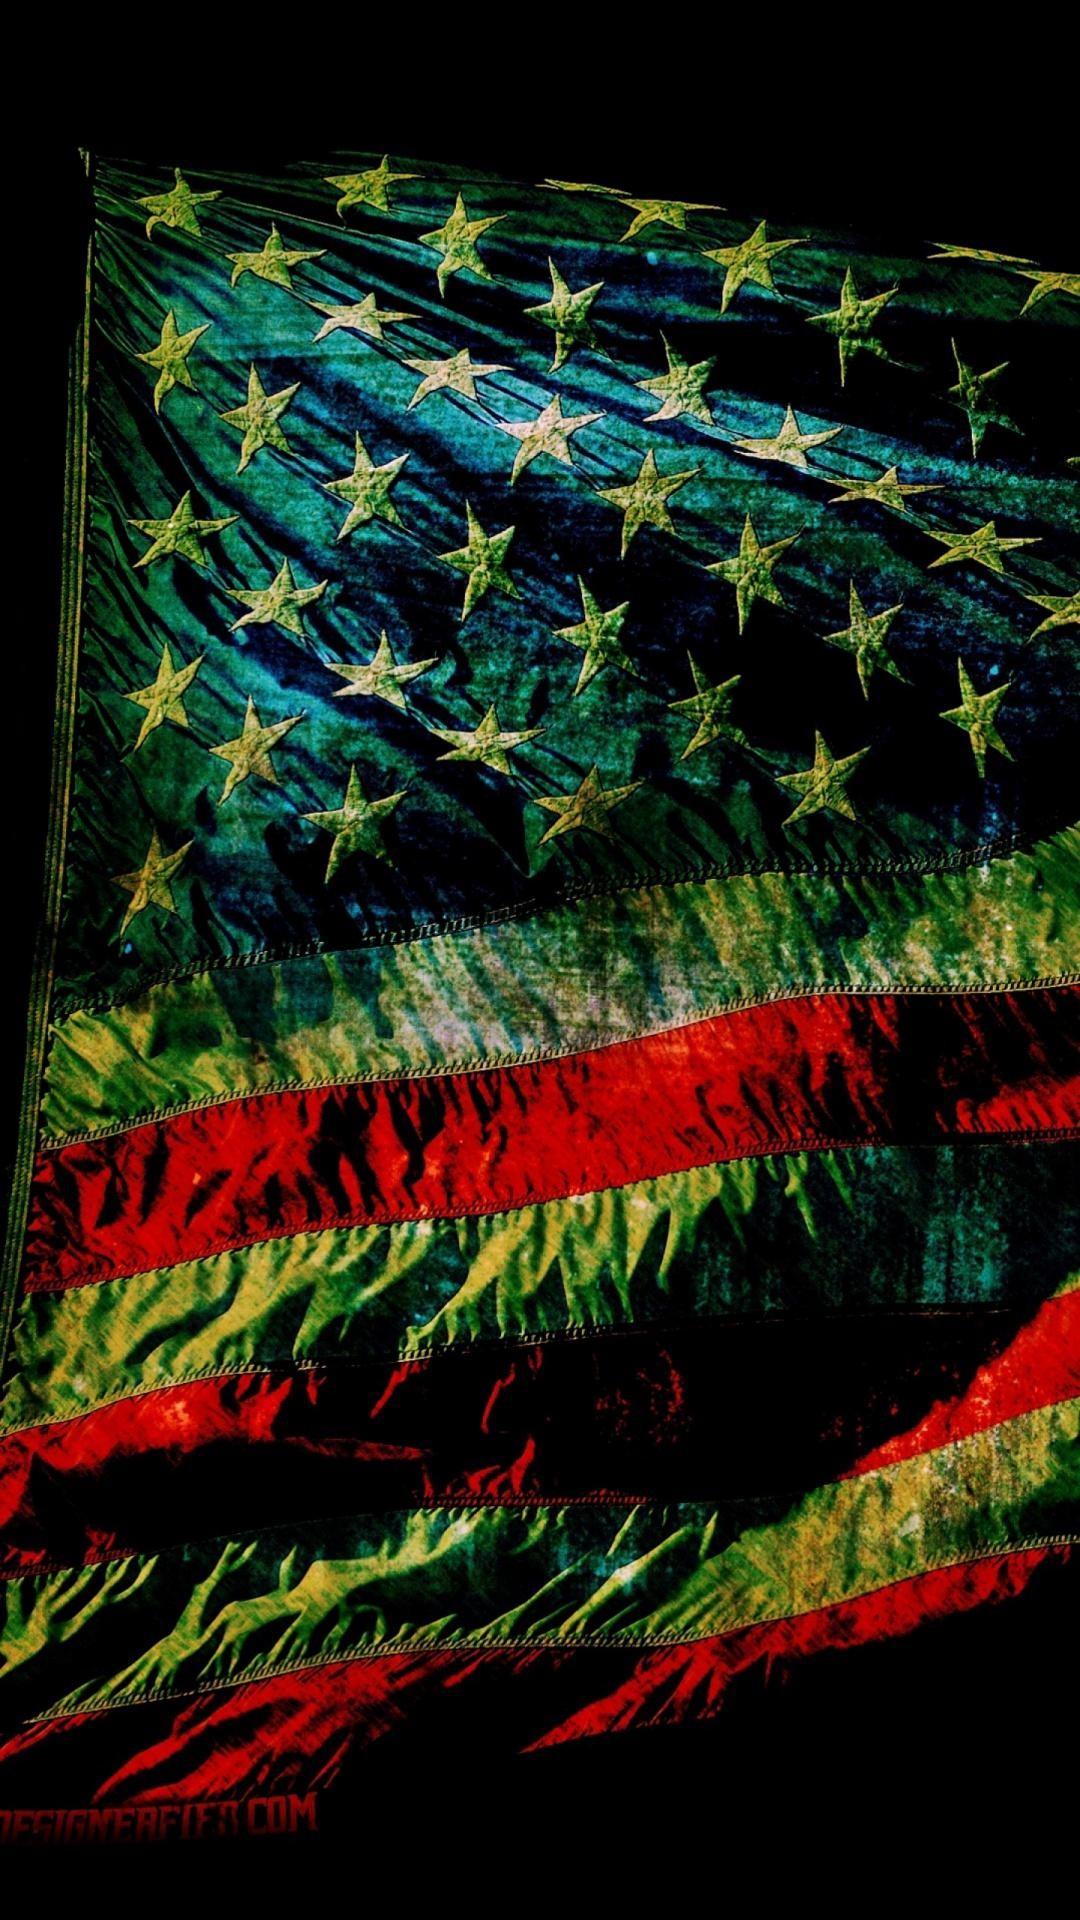 wallpaper.wiki-Free-American-Flag-Iphone-Wallpaper-Download-